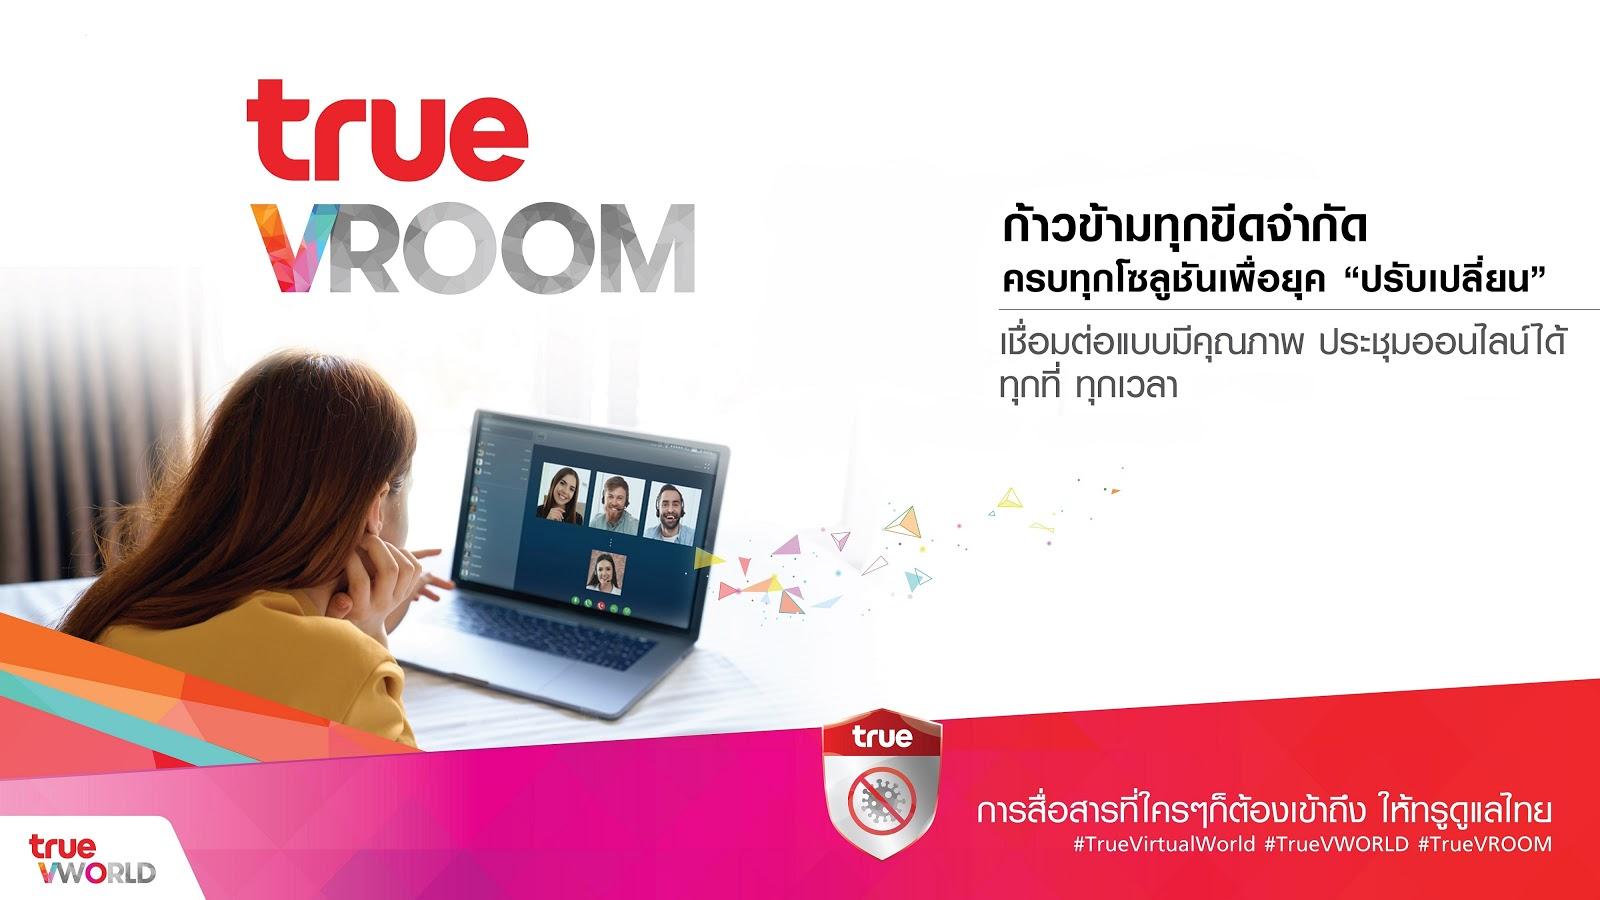 "TRUE Group ชวนเปิดประสบการณ์ใหม่ ""True VROOM"" ห้องประชุมและห้องเรียนเสมือนจริง สัญชาติไทย"